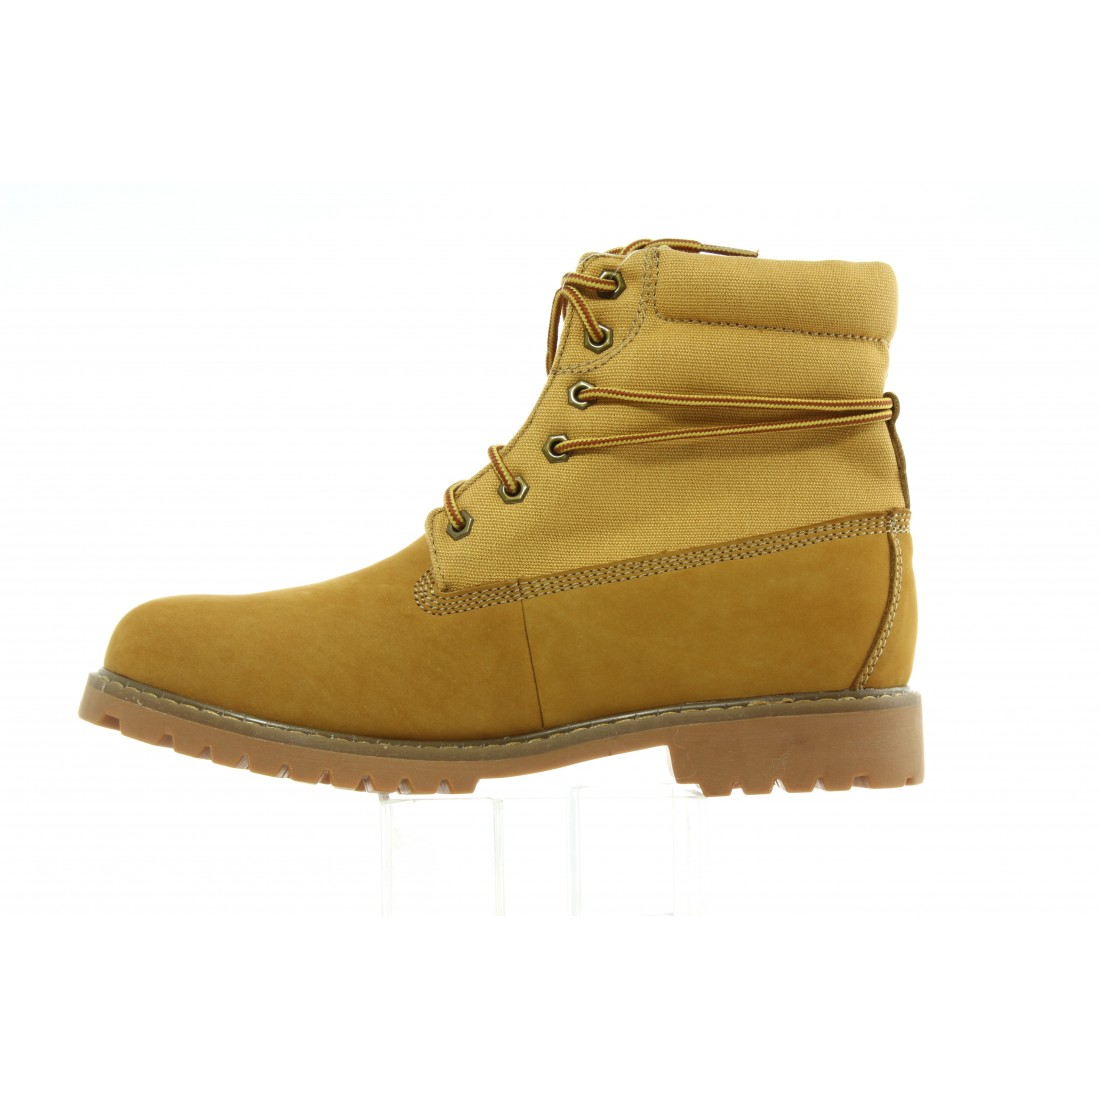 MTJ-17-513-013B Żółty